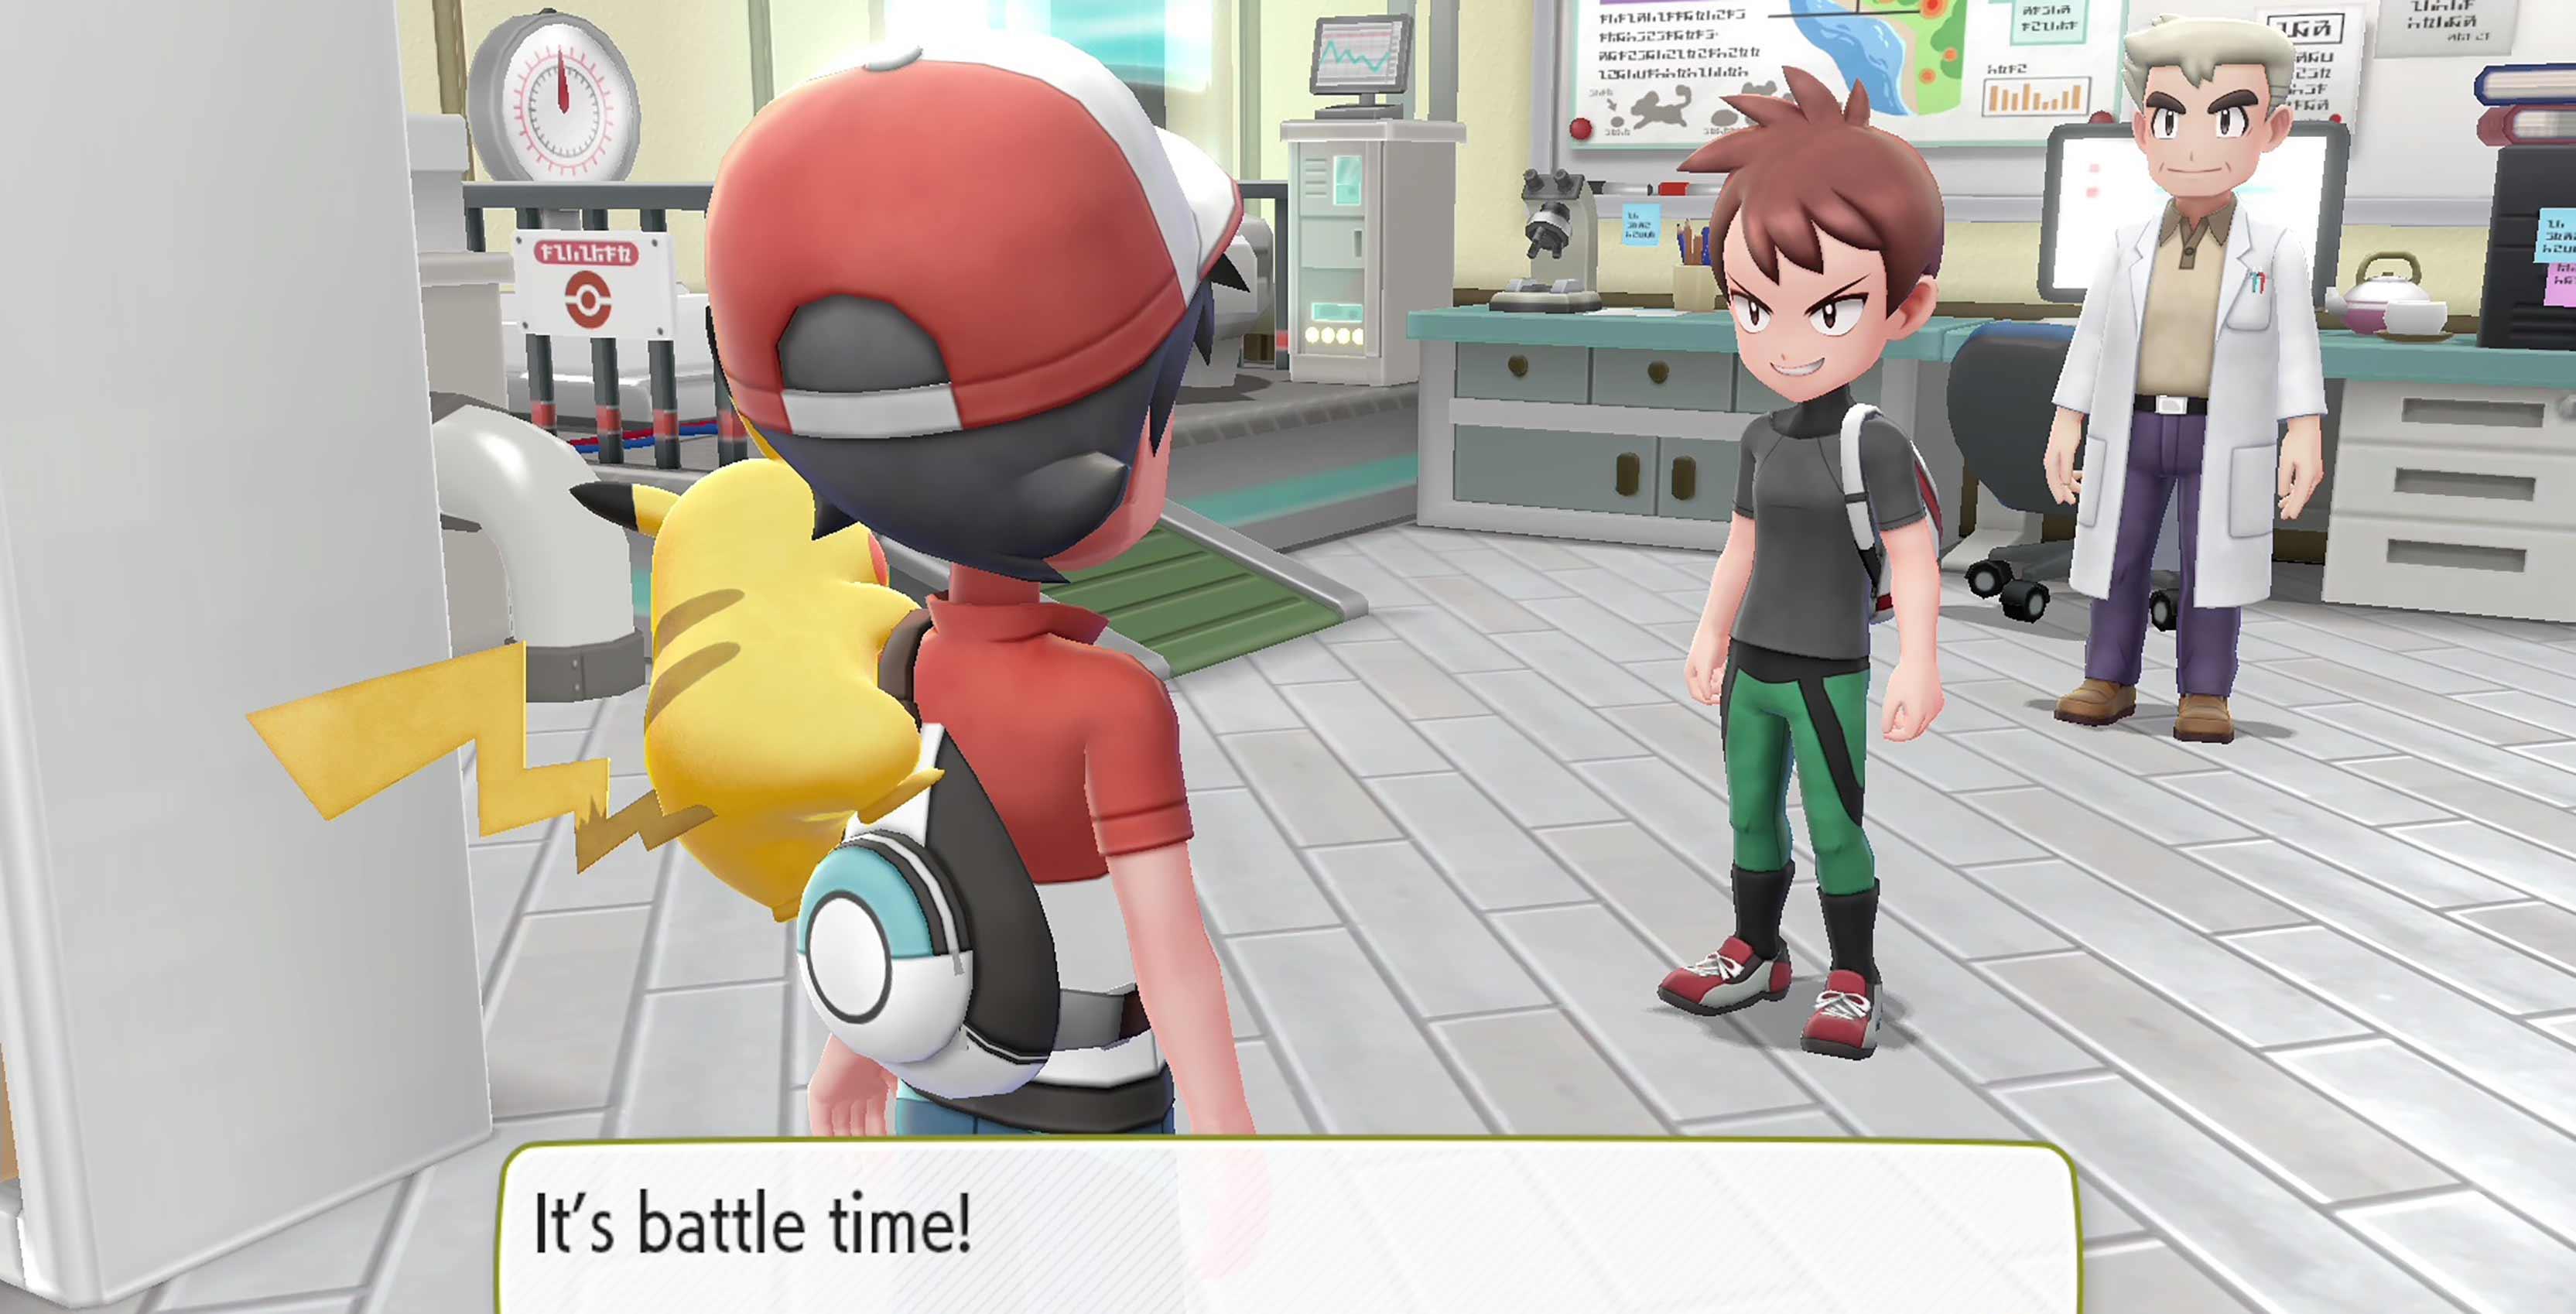 Pokémon, Let's Go!